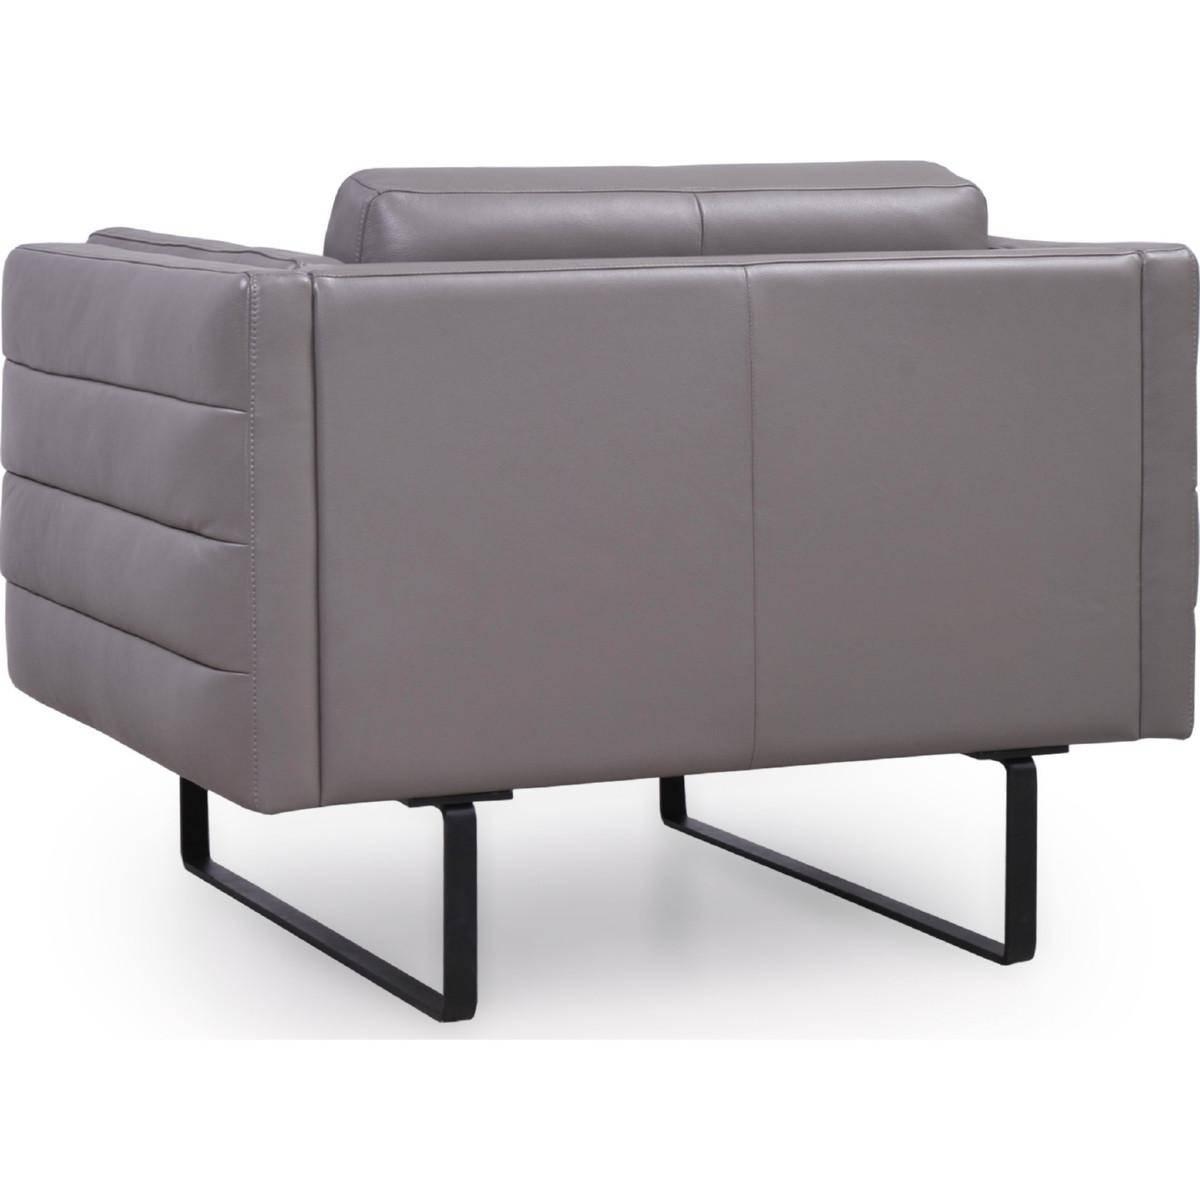 Buy Moroni Orson 582 Sofa Armchair Set 2 Pcs In Gray, Top Regarding Fashionable Orsen Tv Stands (View 8 of 25)